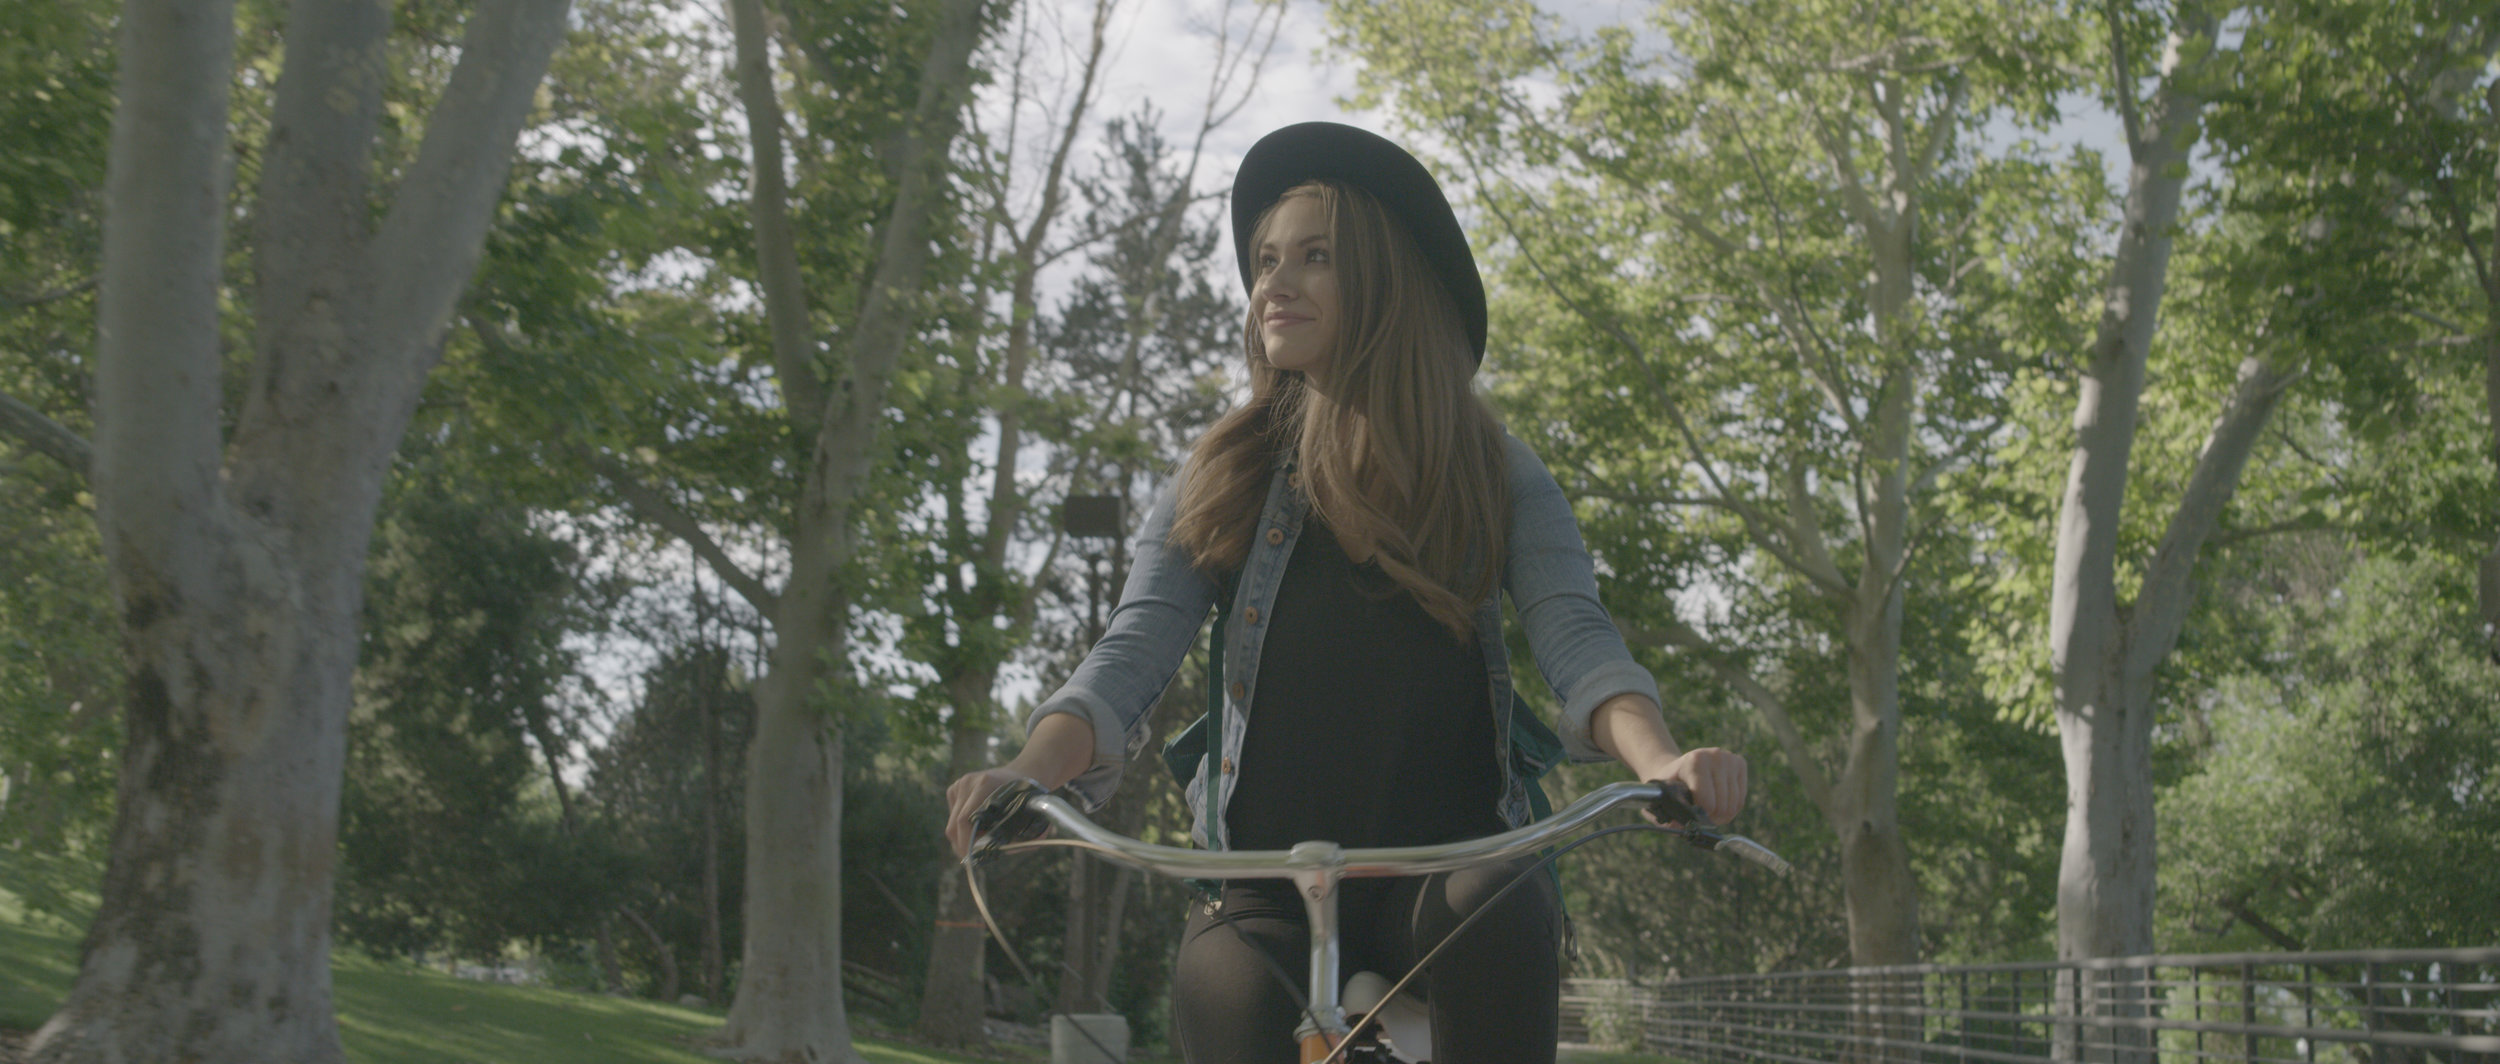 Girl Bikeriding.jpg